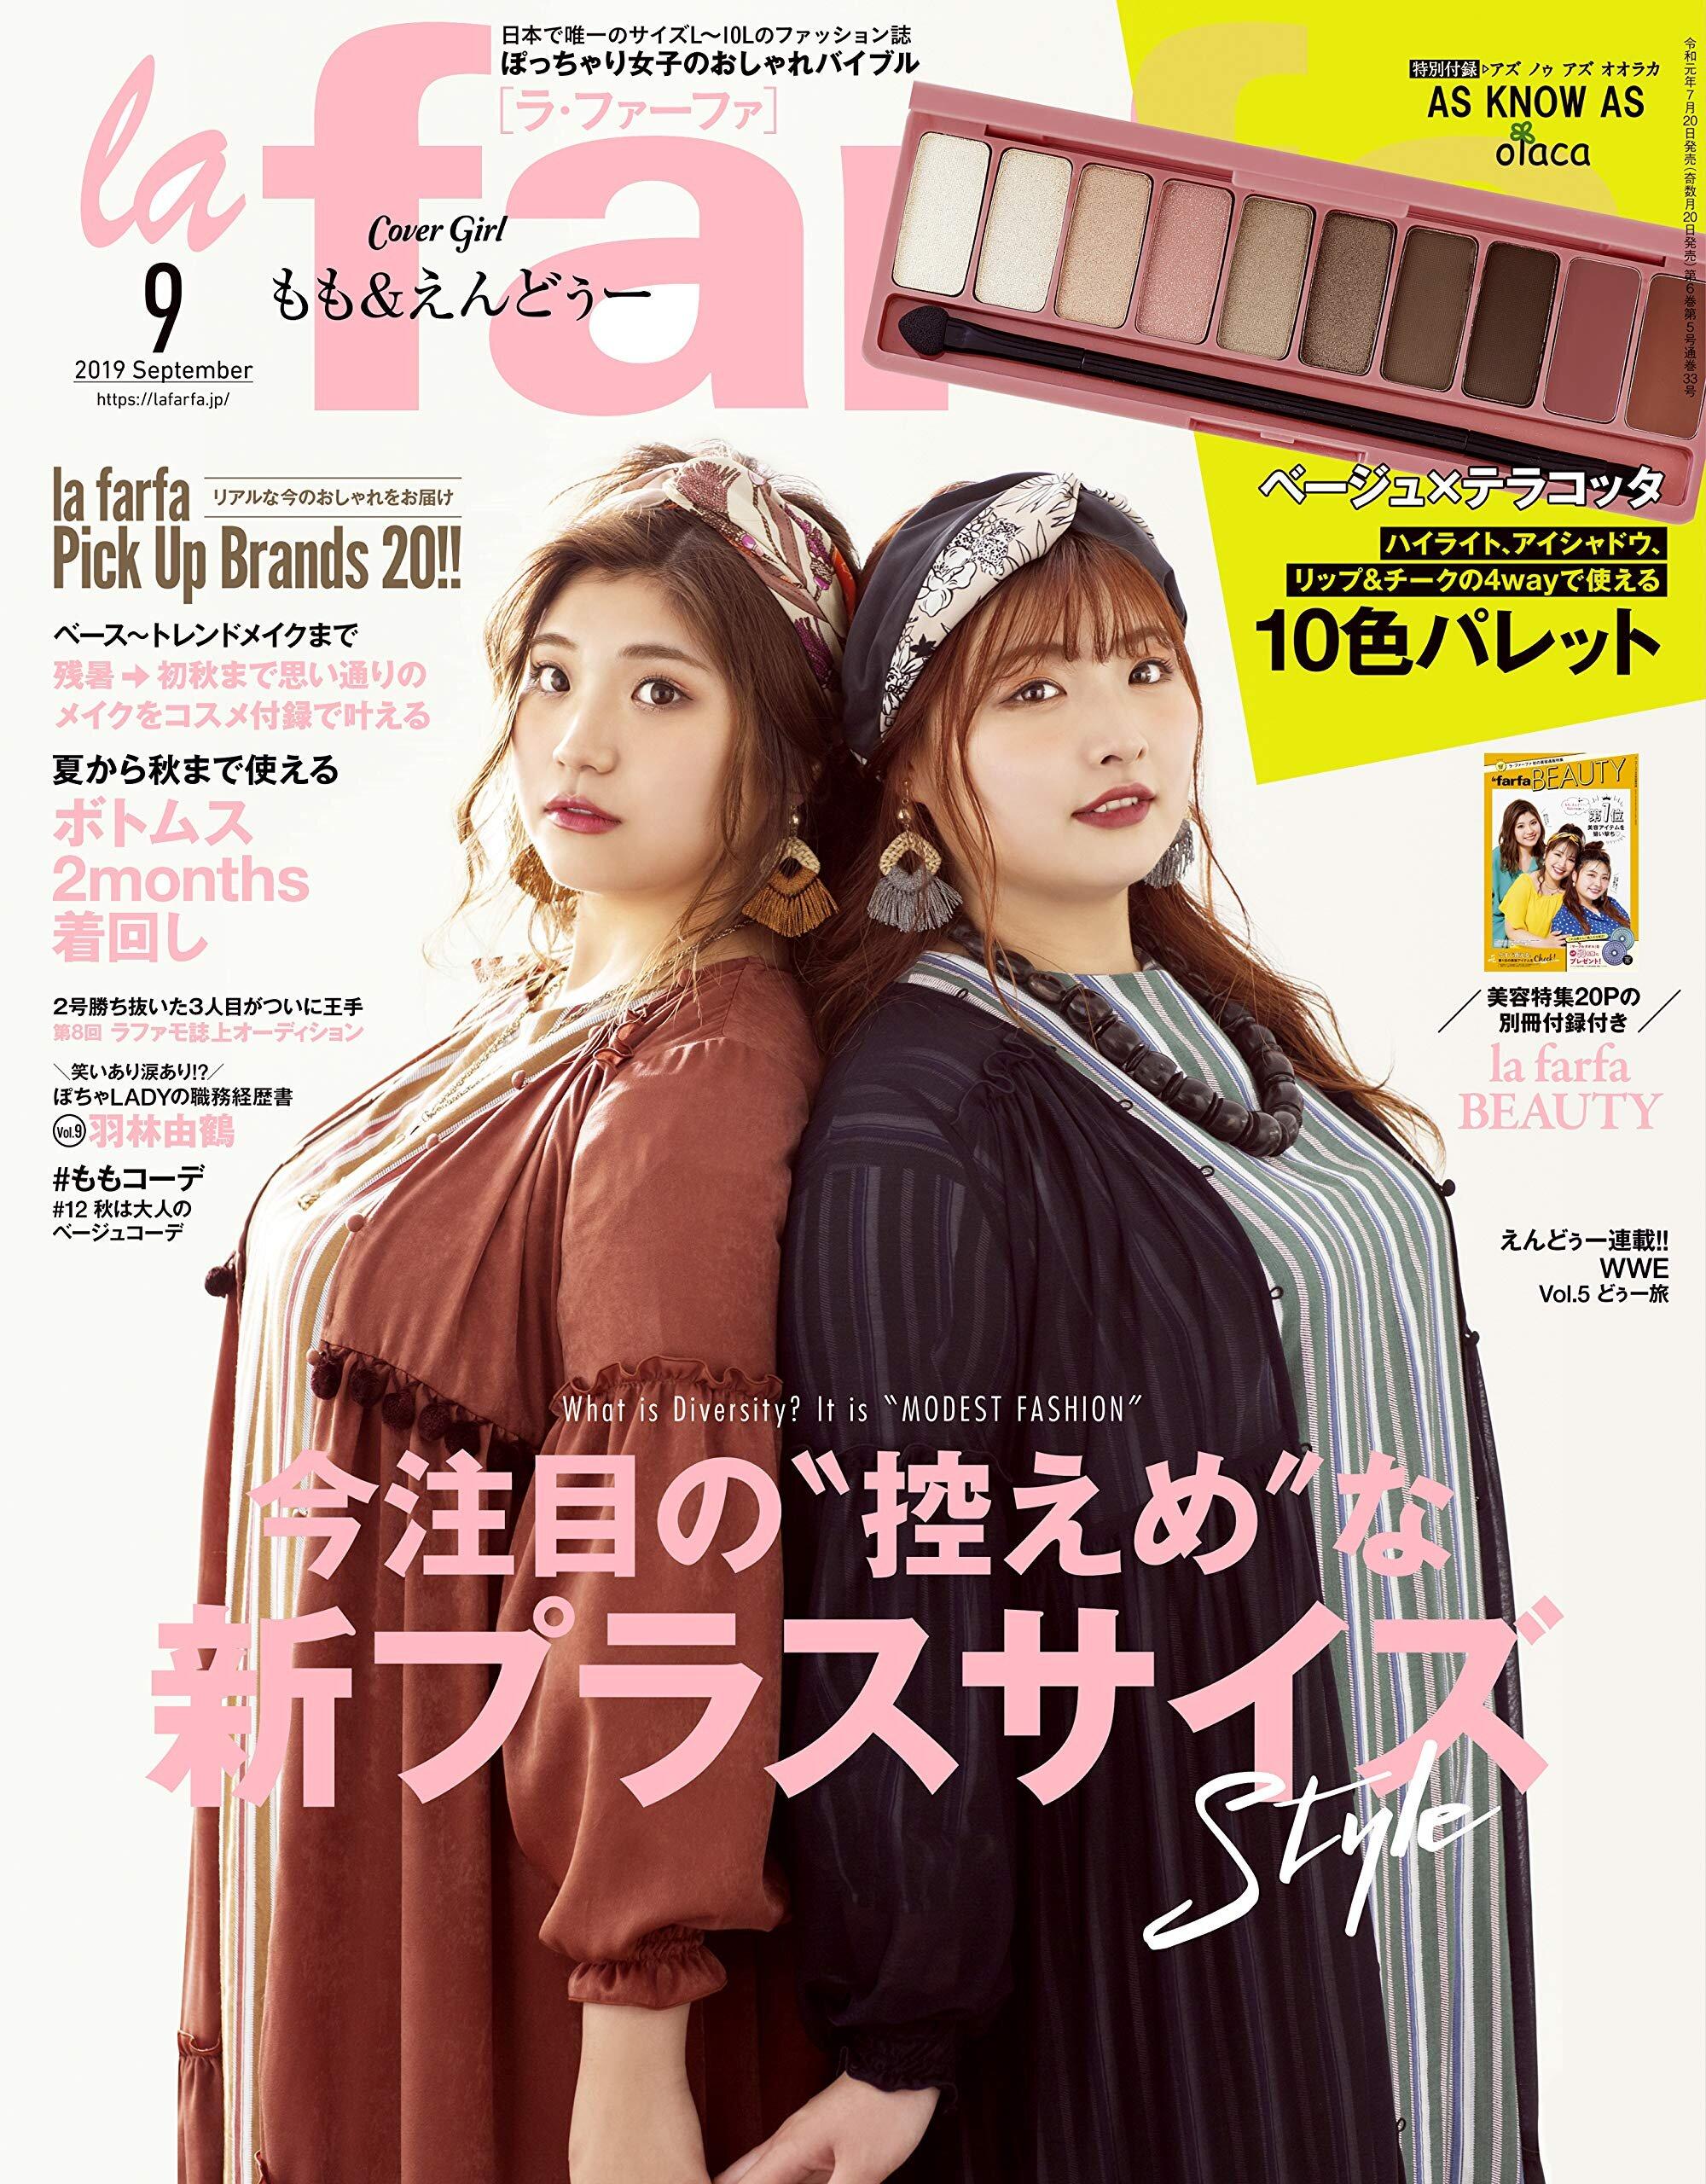 日本大尺碼女孩時尚雜誌 — La Farfa 2019年9月號;Credit to  Amazon